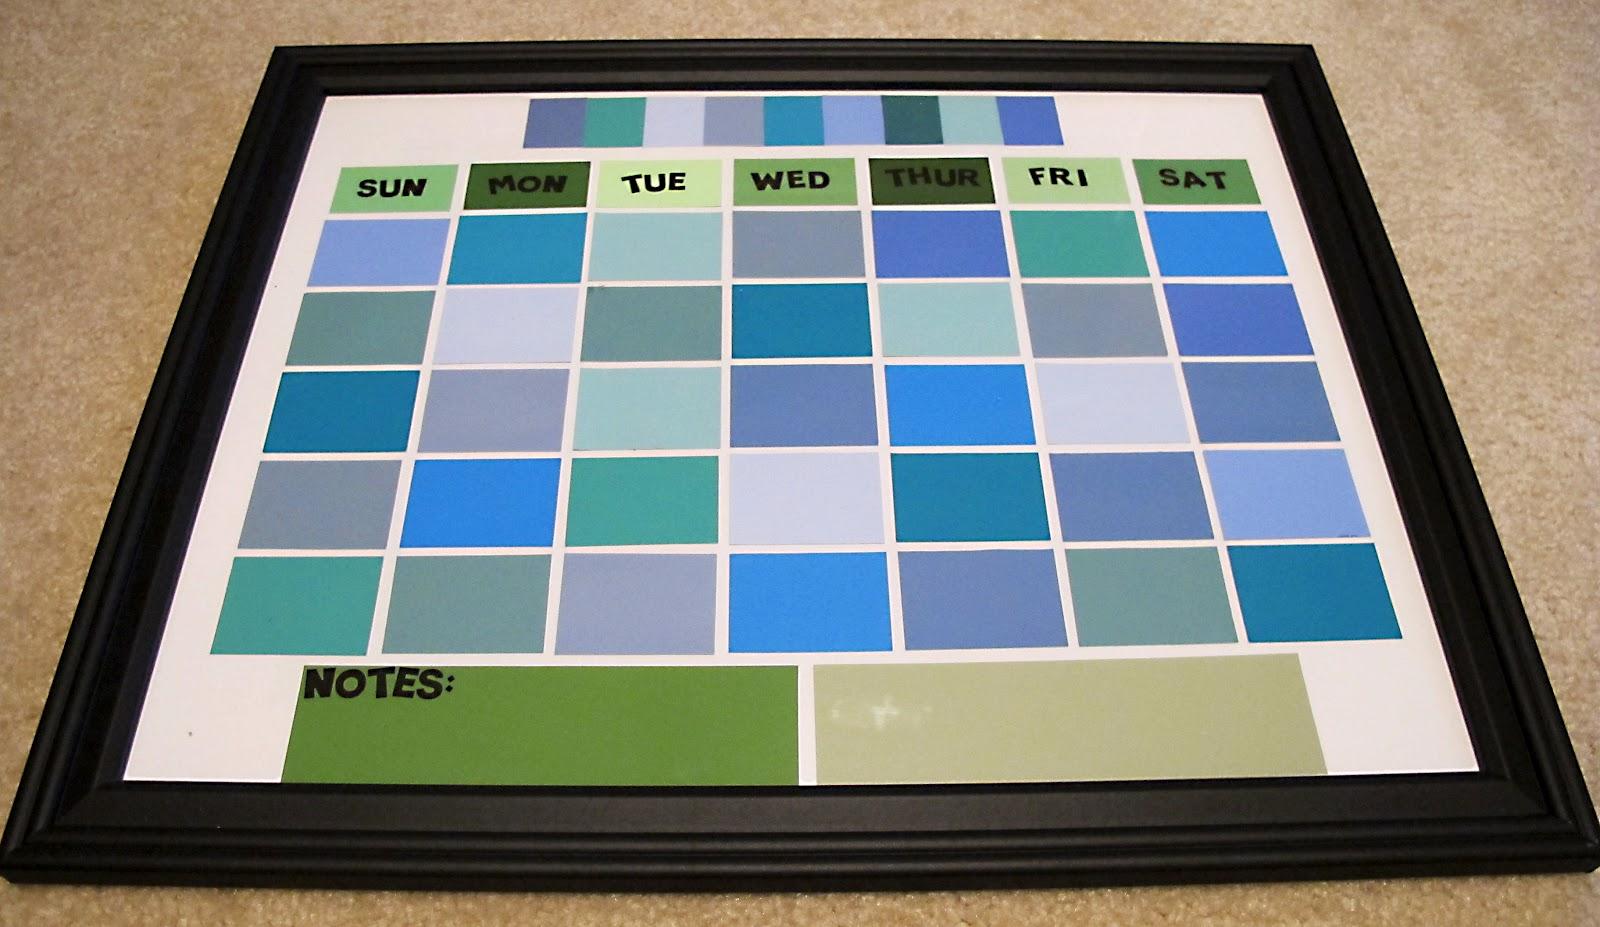 Paint Sample Calendar Diy : So many sweets diy paint sample dry erase calendar